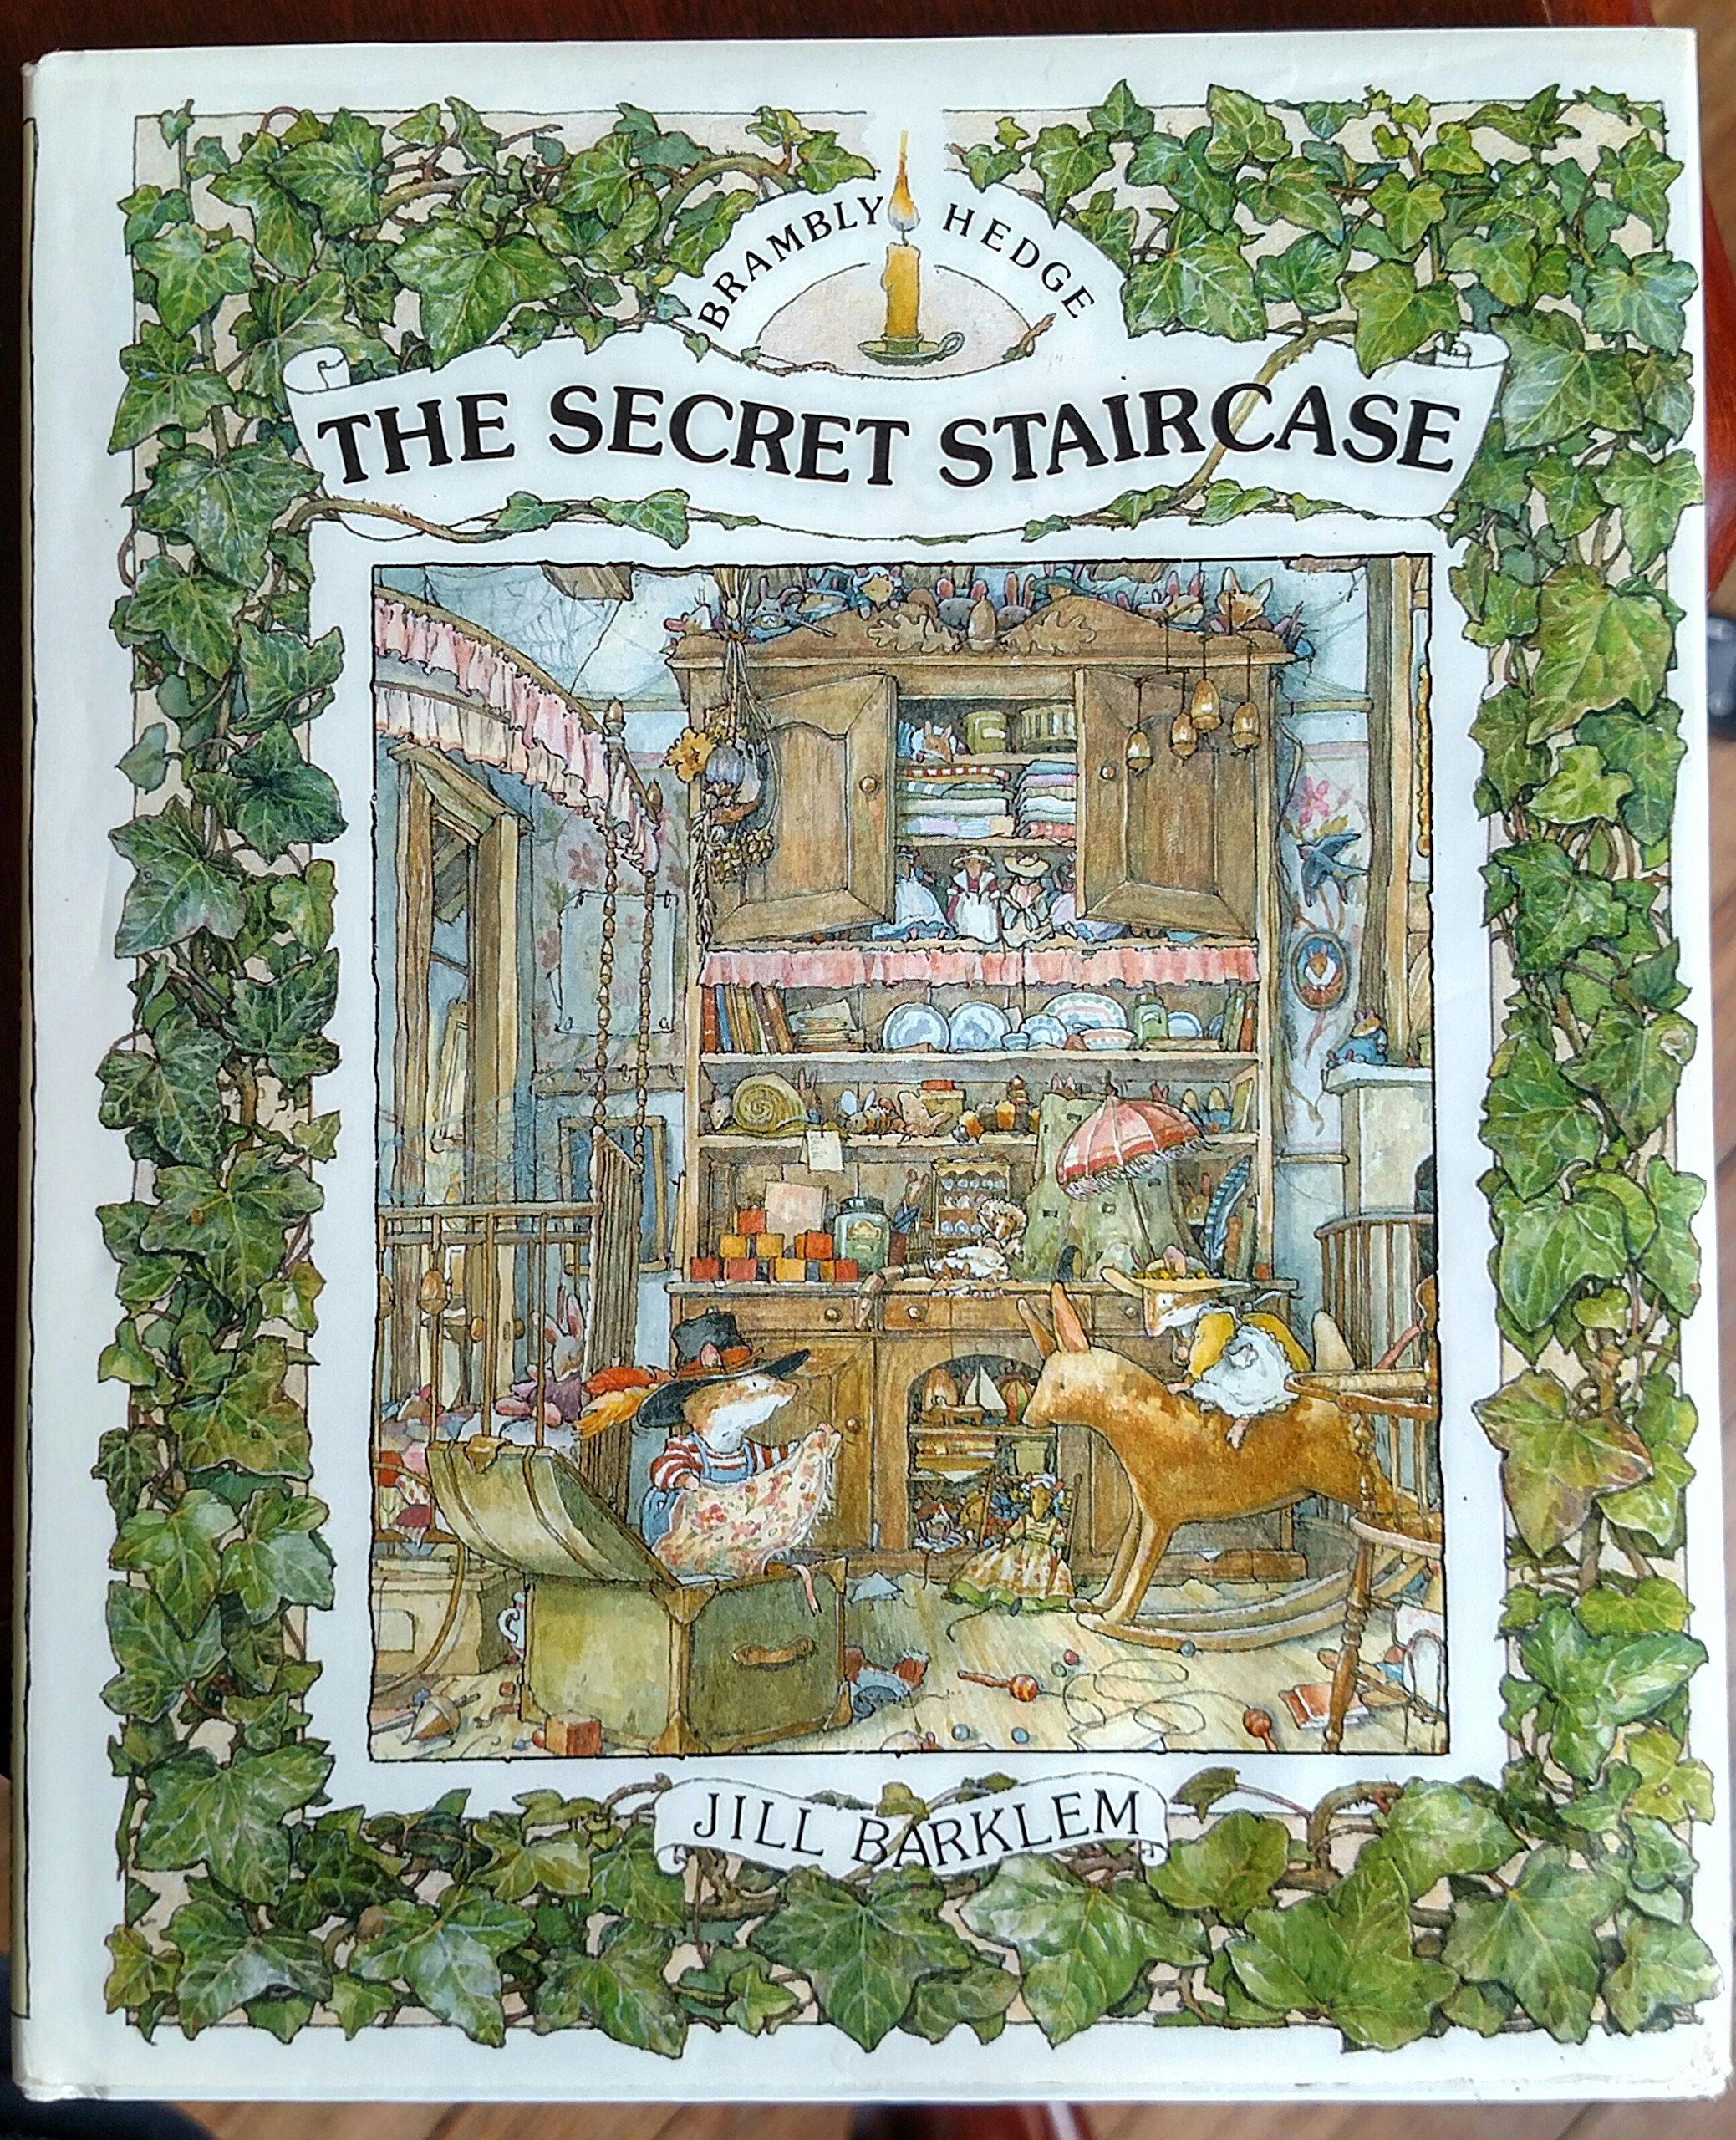 The Secret Staircase (Miniature Edition): Jill Barklem: 9780399218651:  Amazon.com: Books